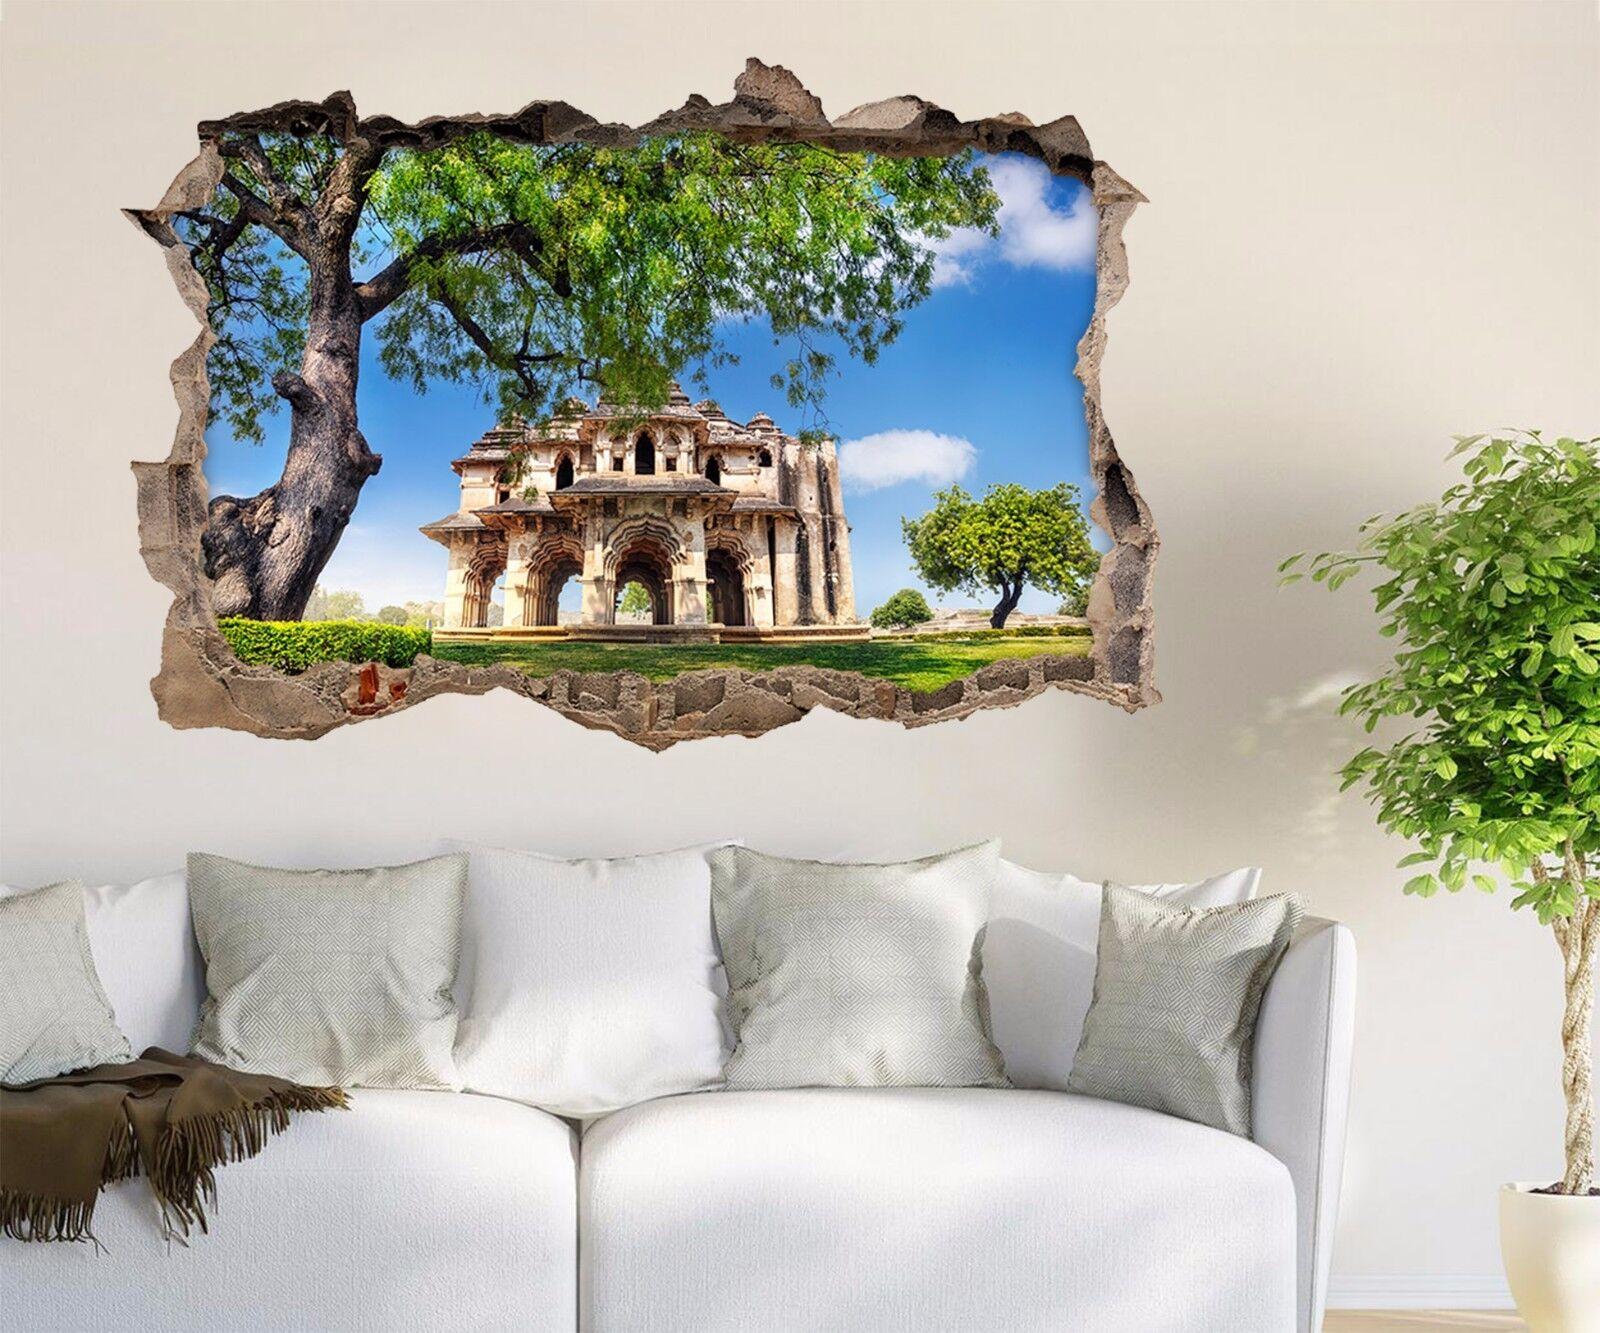 3D Torre Pascoli 318 Parete Murales Adesivi Decal Sfondamento AJ WALLPAPER IT